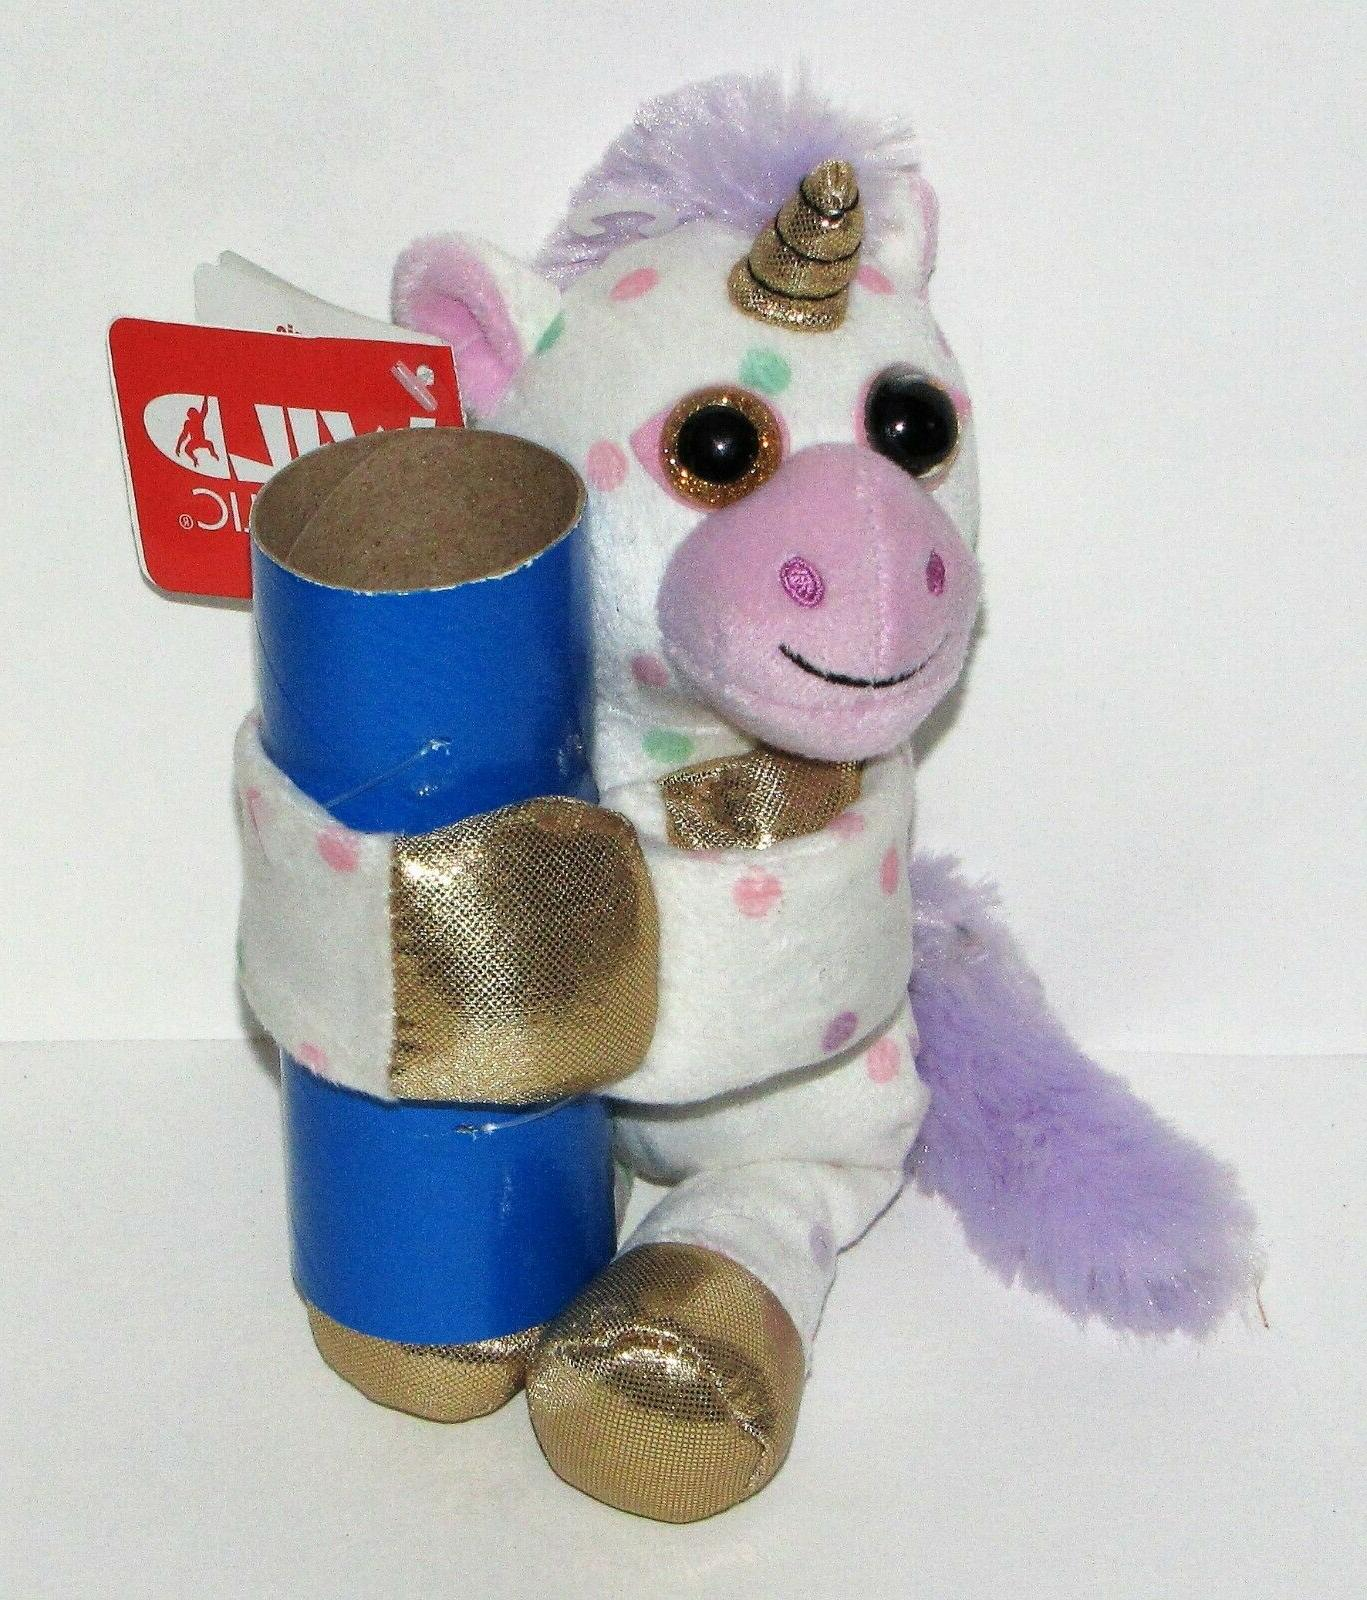 Best Stuffed Animals For Boy, Wild Republic Huggers Unicorn Plush Slap Bracelet Stuffed